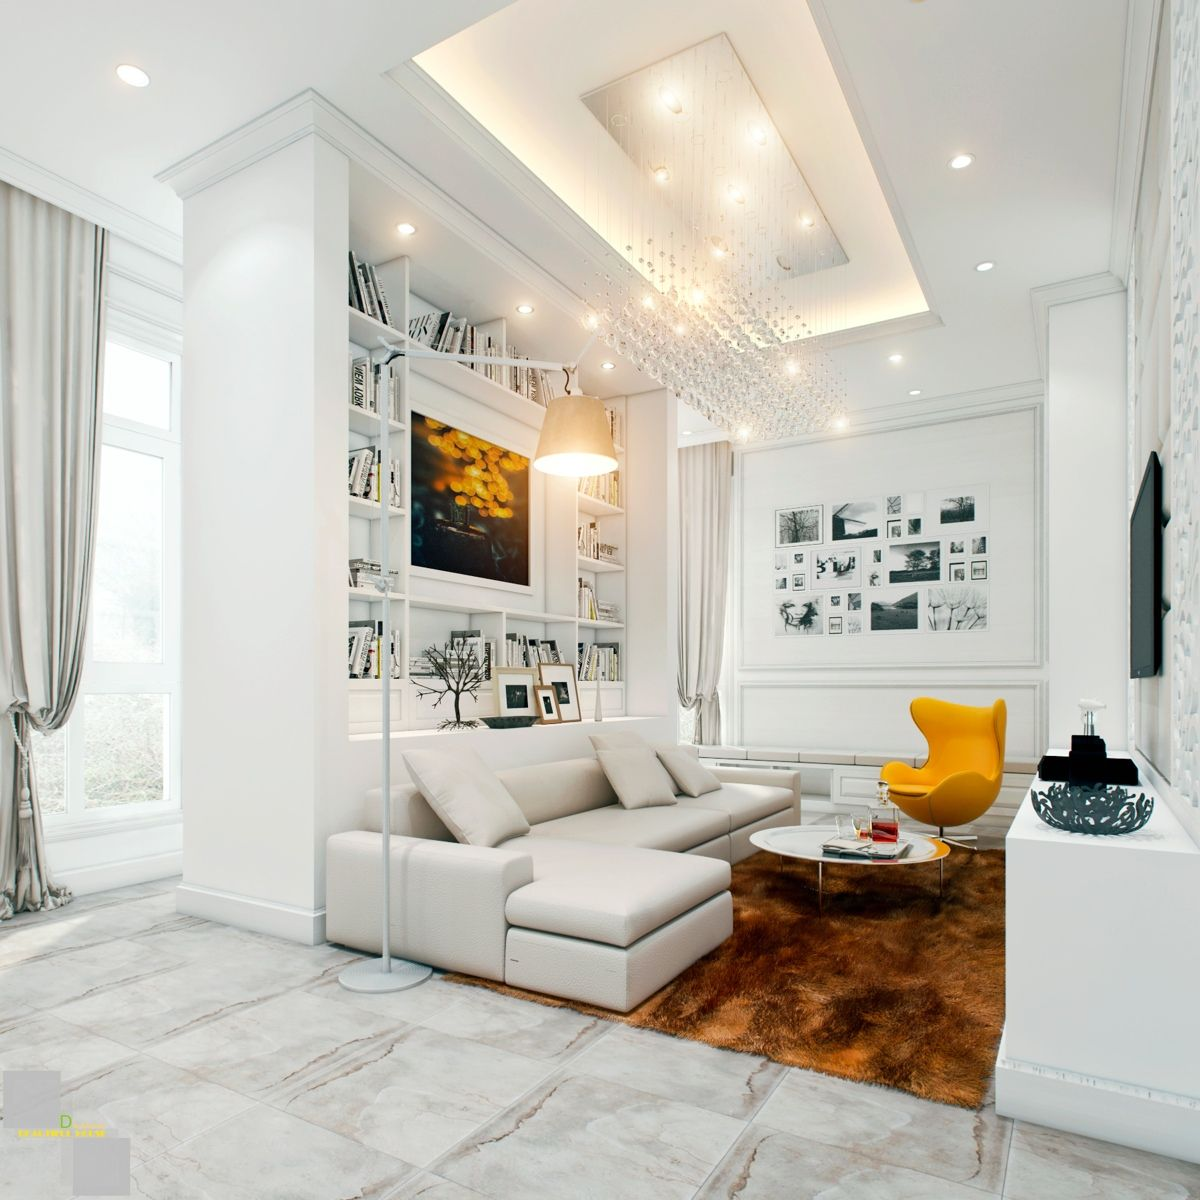 living-room-white-puffy-sofa-white-pillow-yellow-modern-chair-orange ...